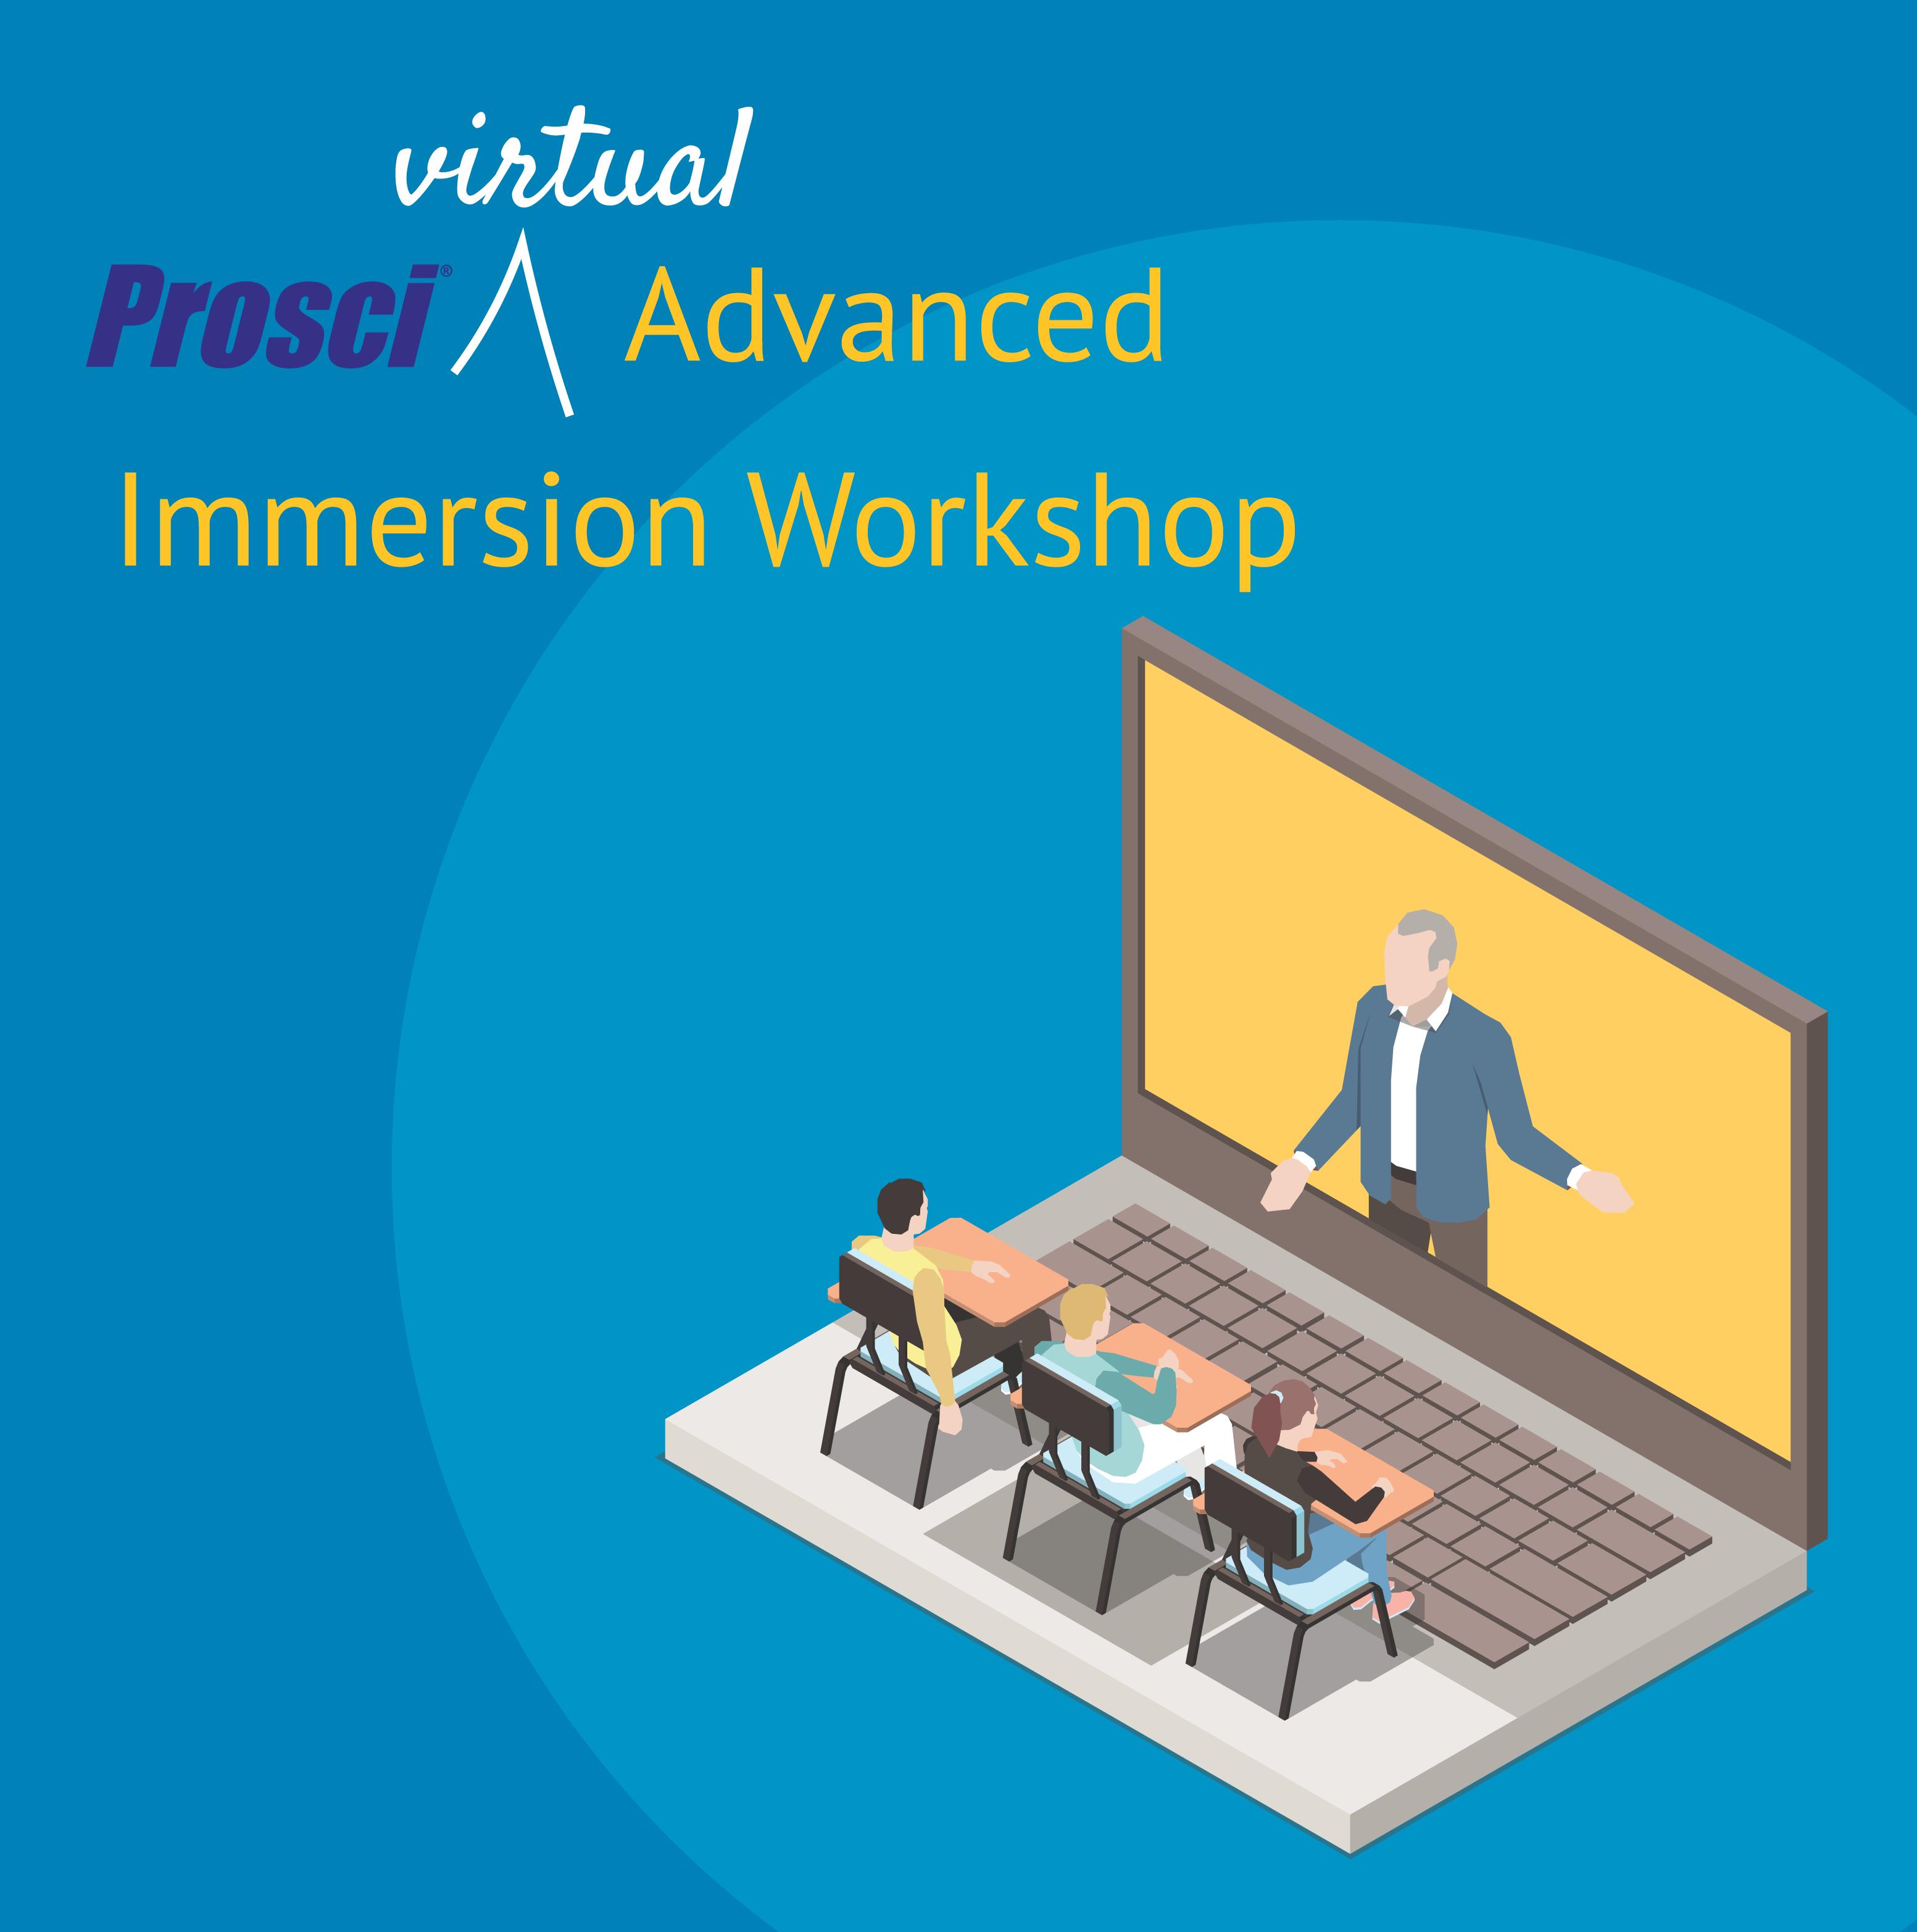 Prosci® Advanced Immersion Workshop